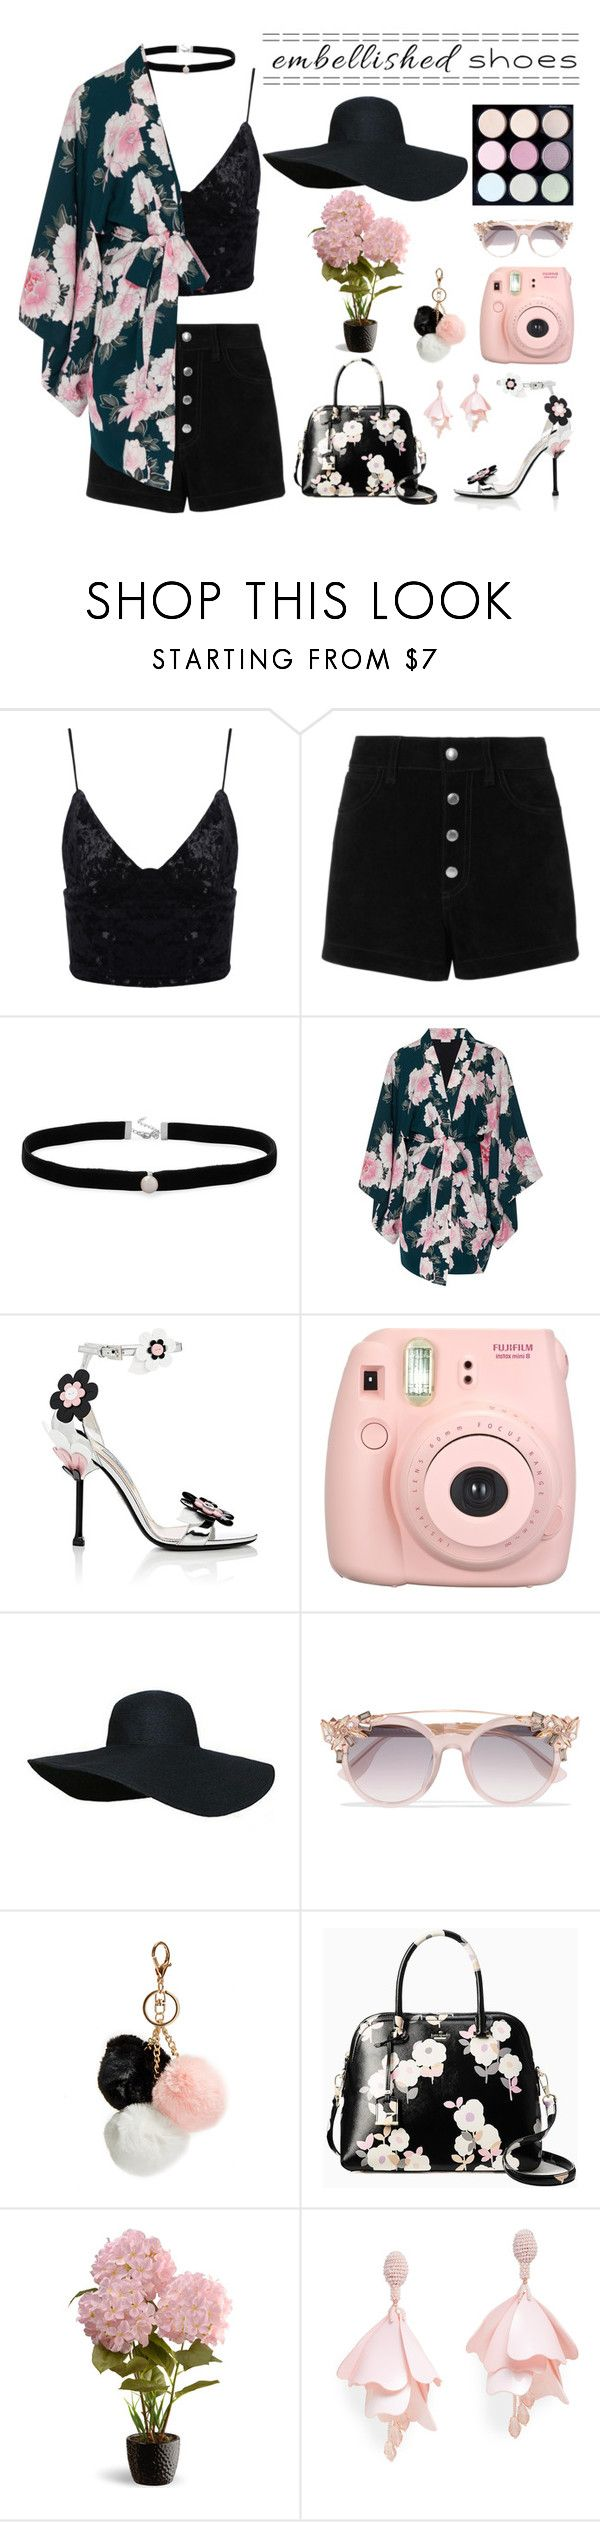 """Embellished Shoes"" by aridhina ❤ liked on Polyvore featuring rag & bone/JEAN, Amanda Rose Collection, Fleur du Mal, Prada, Fujifilm, Jimmy Choo, GUESS, Kate Spade, National Tree Company and Oscar de la Renta Pink Label"